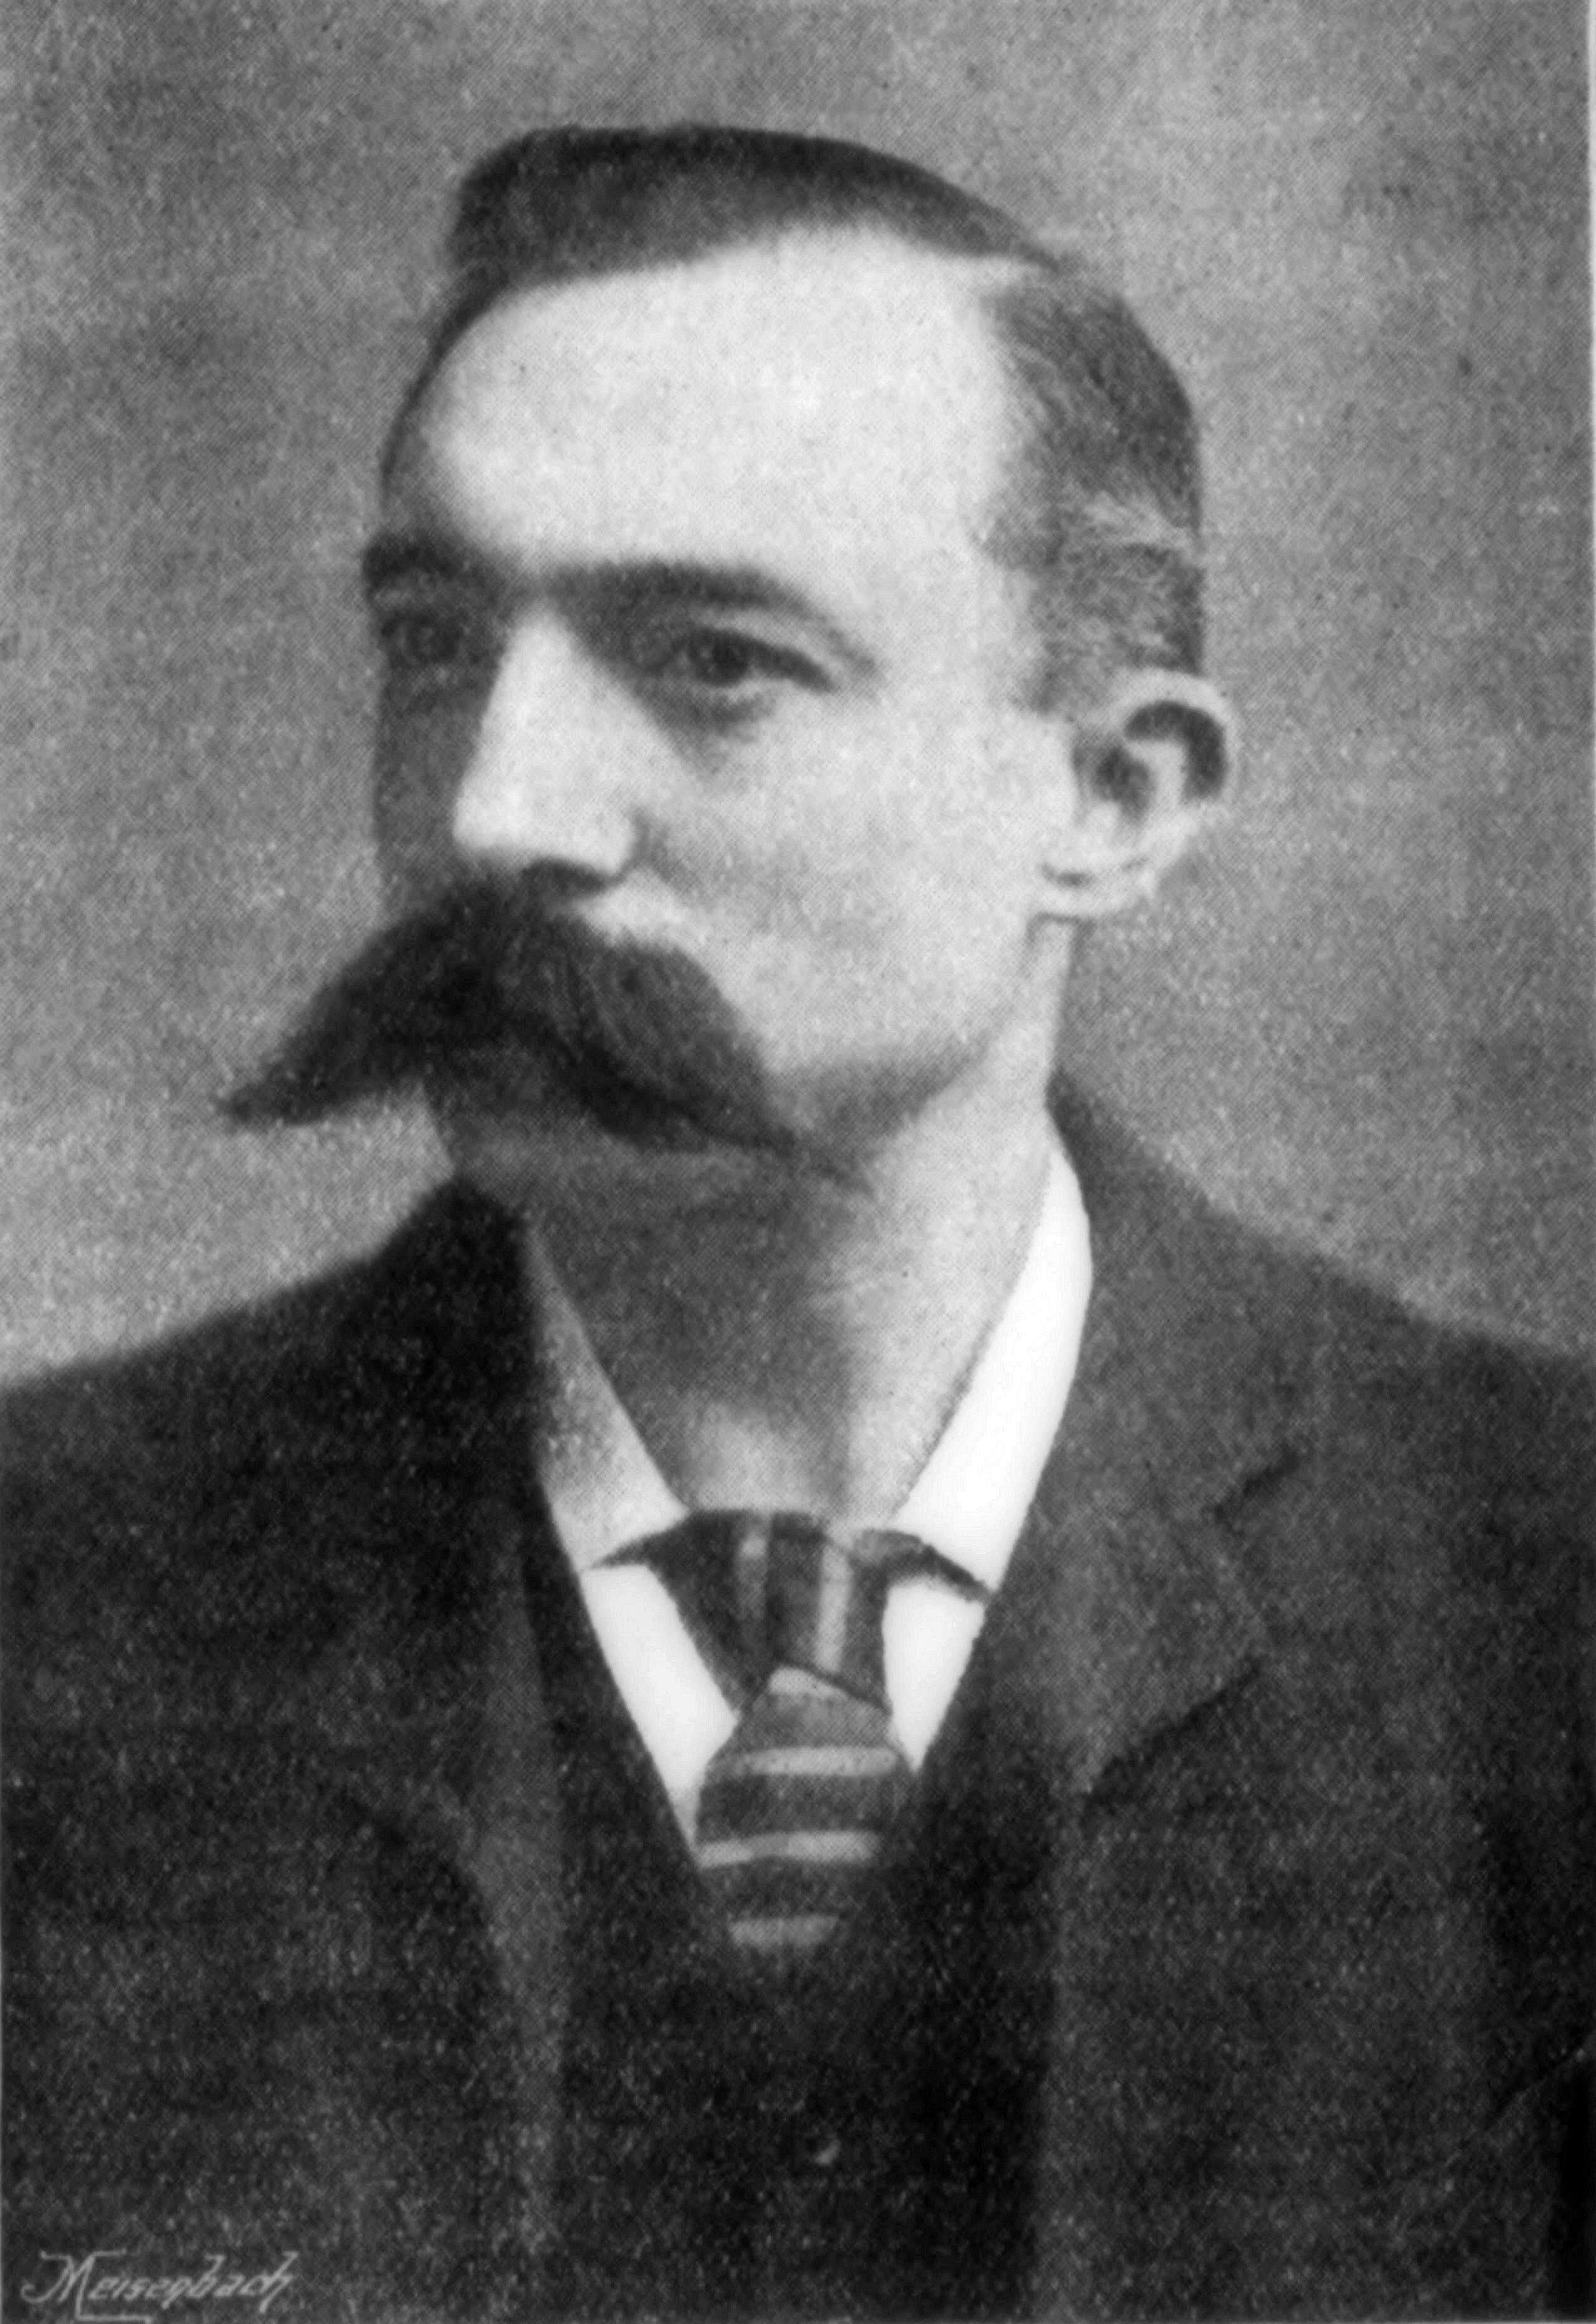 Robert Blatchford in 1895